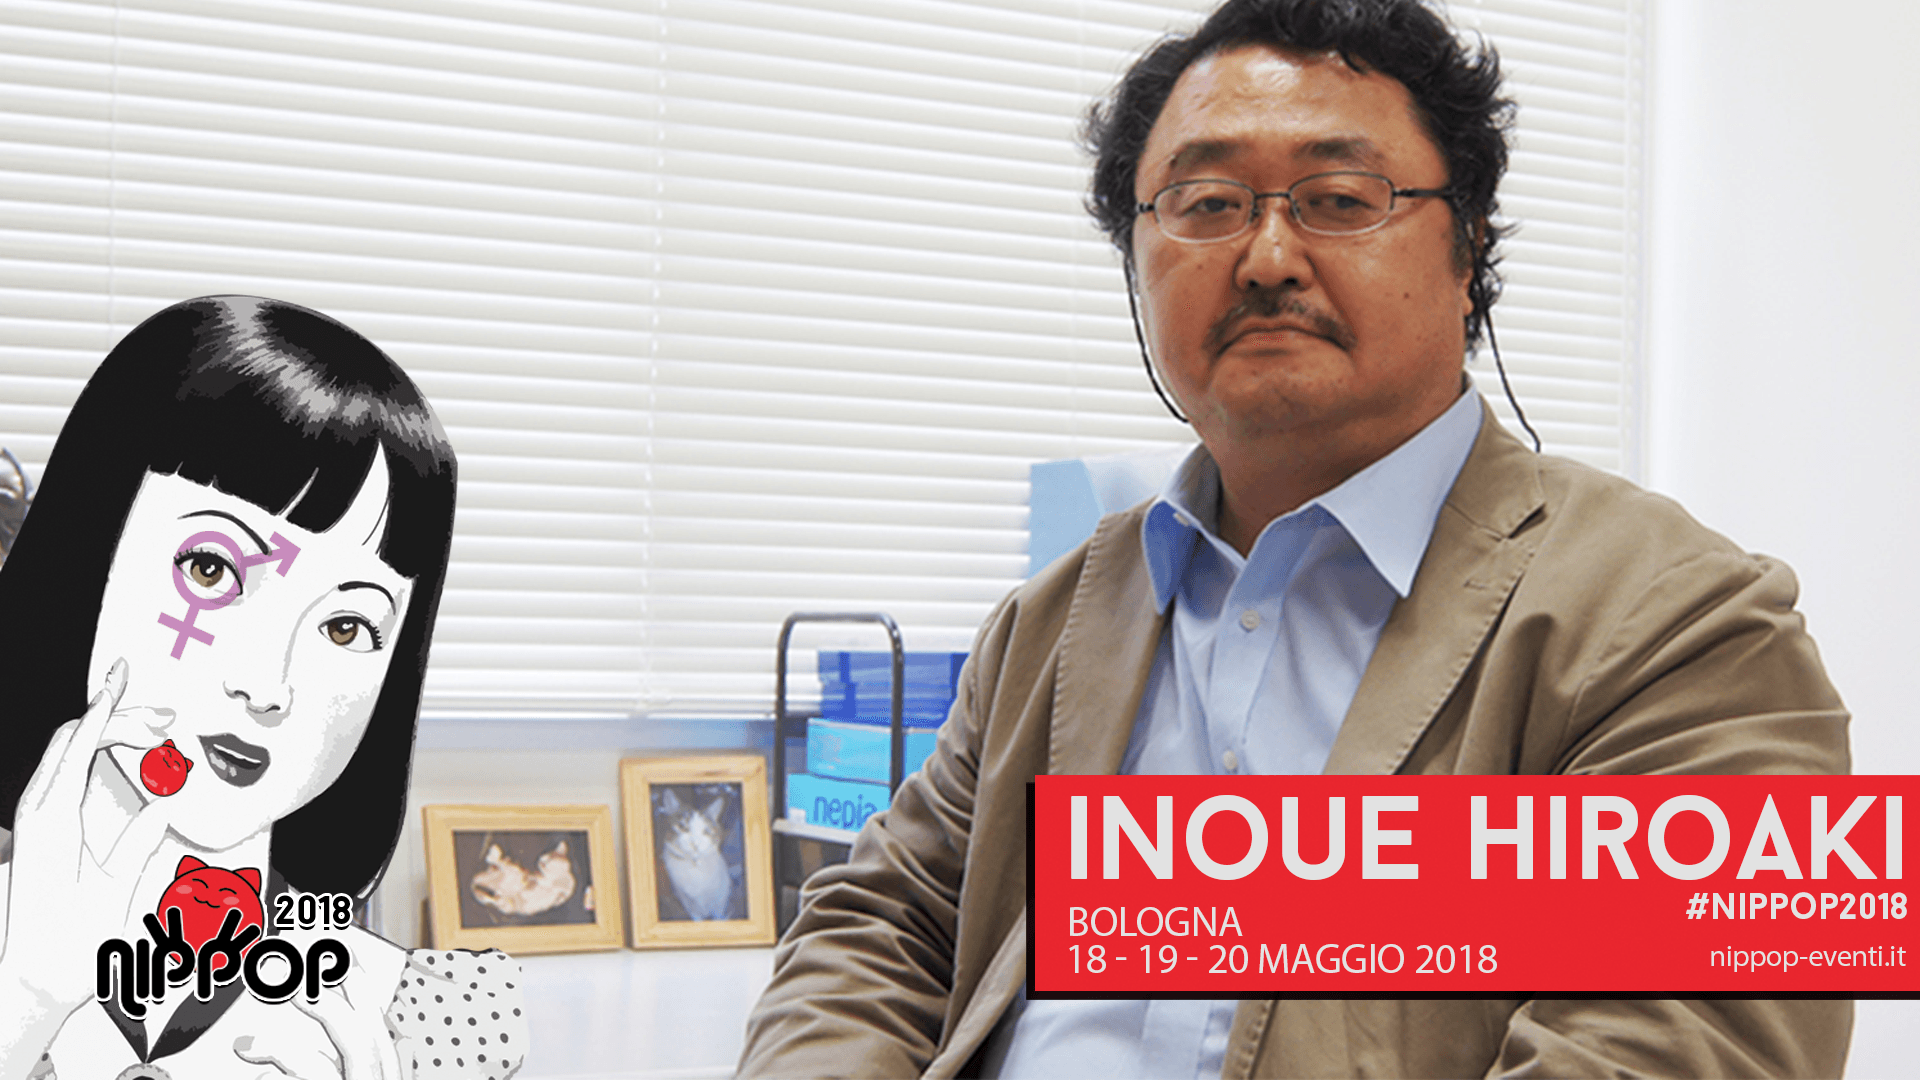 inoue hiroaki nippop 2018